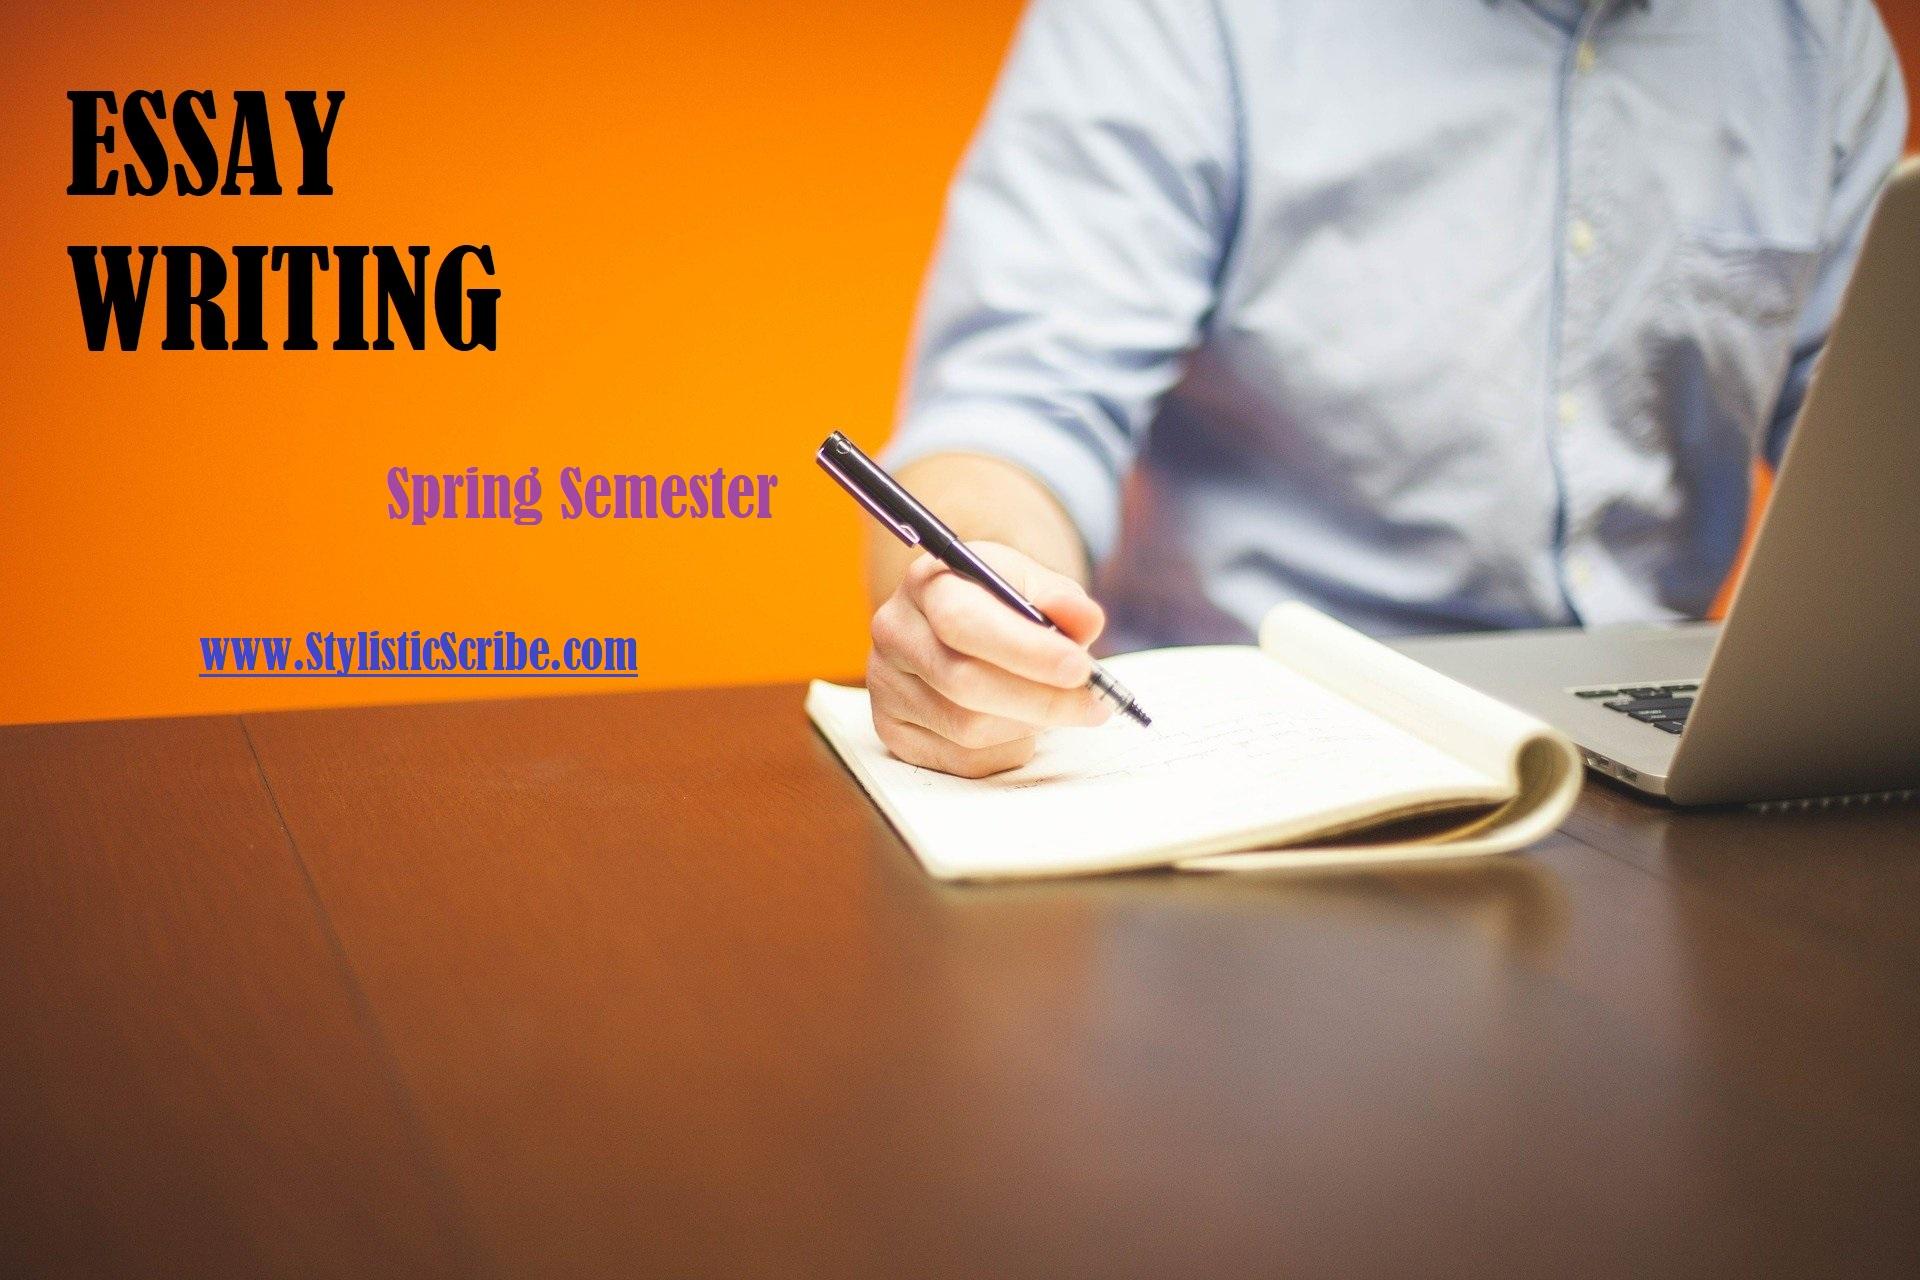 Essay Writing Spring Semester